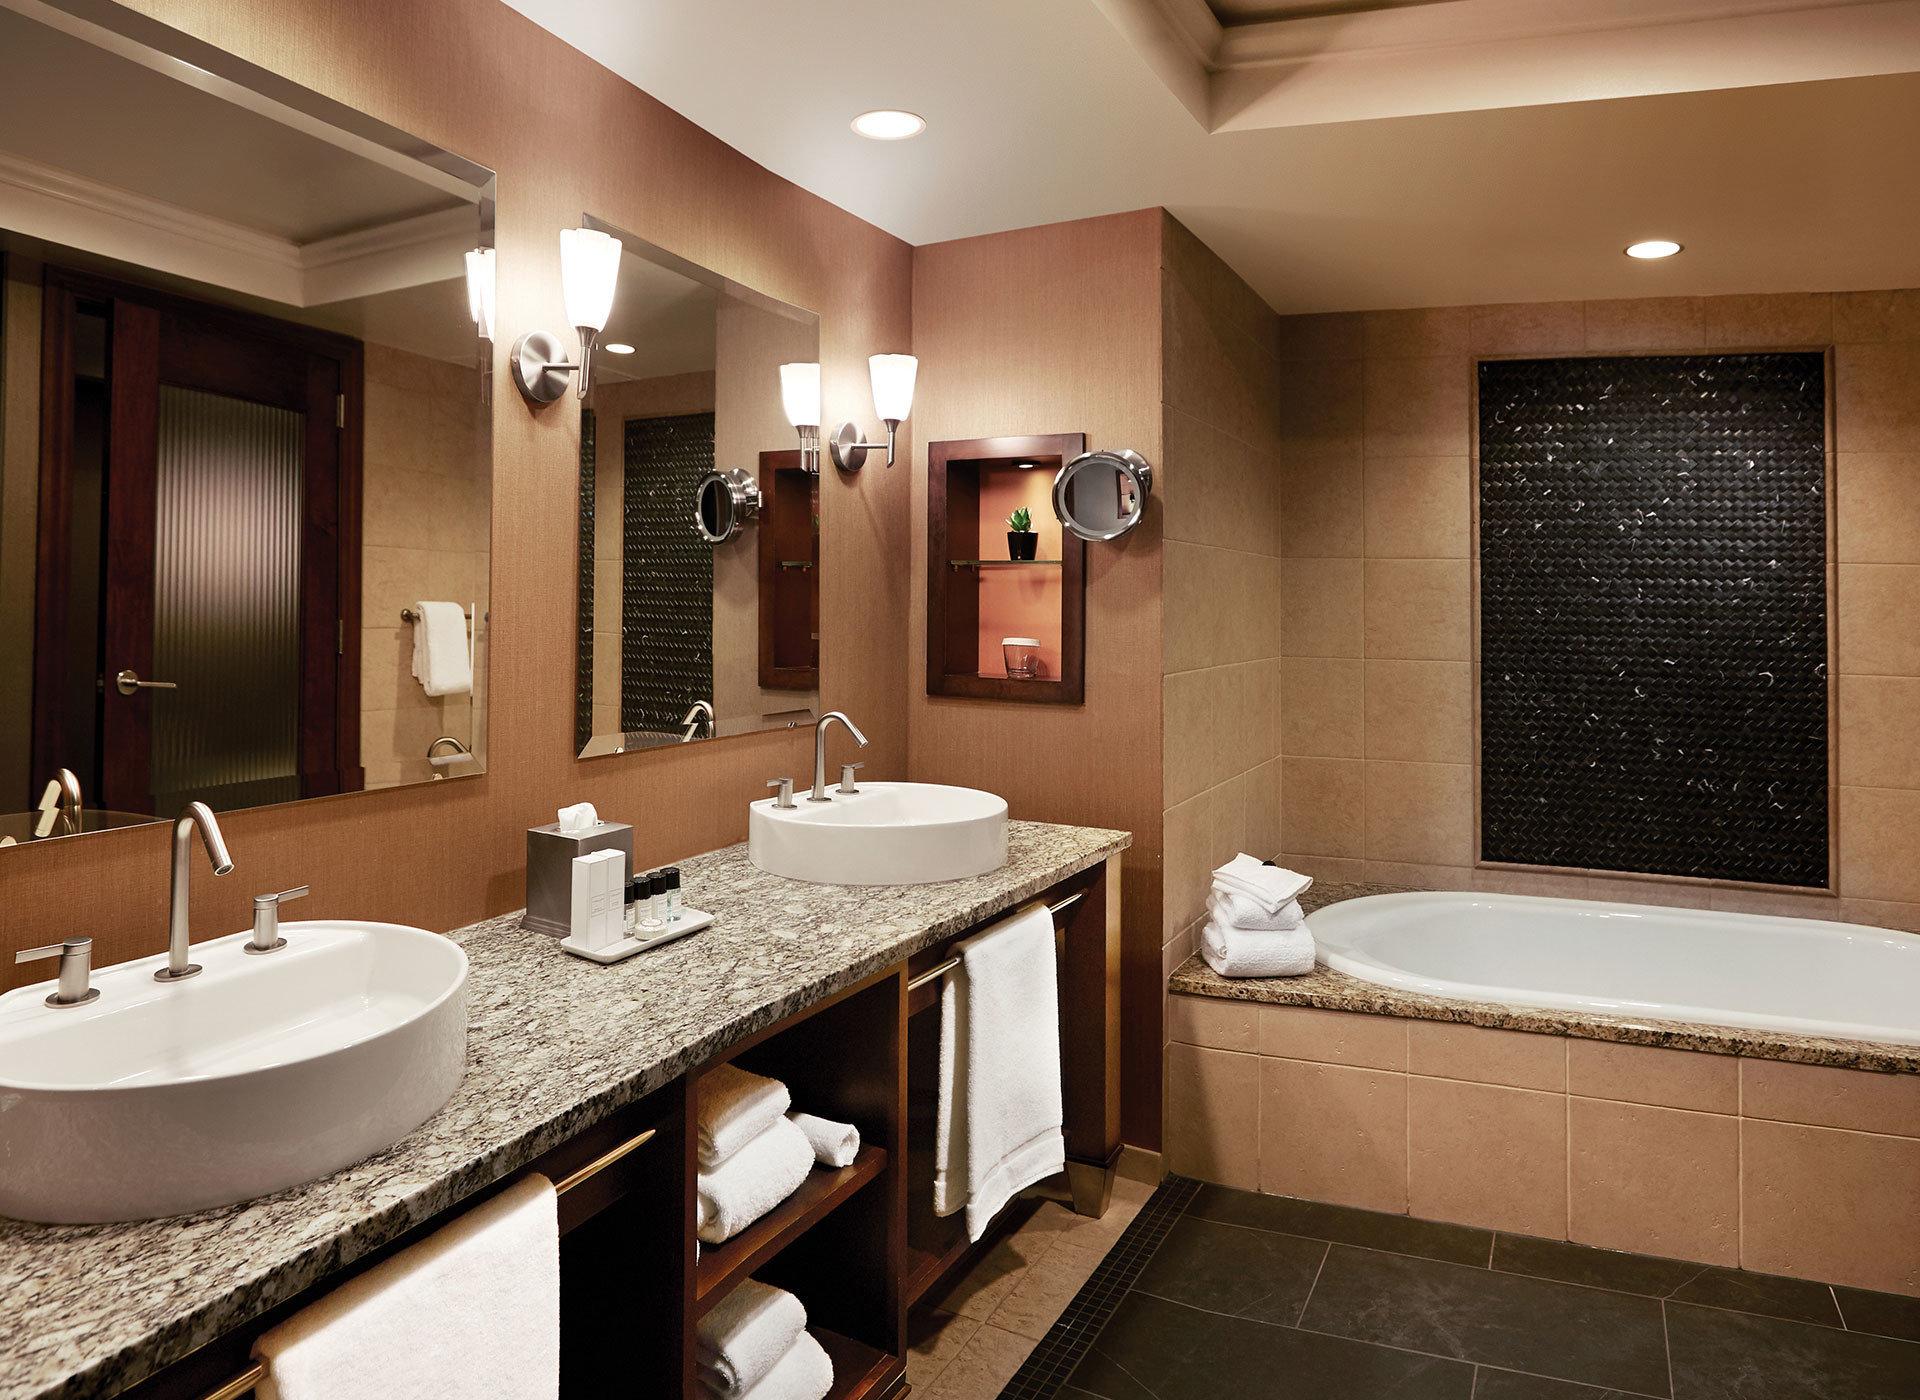 bathroom sink mirror property Suite counter home swimming pool Modern tile tub Bath